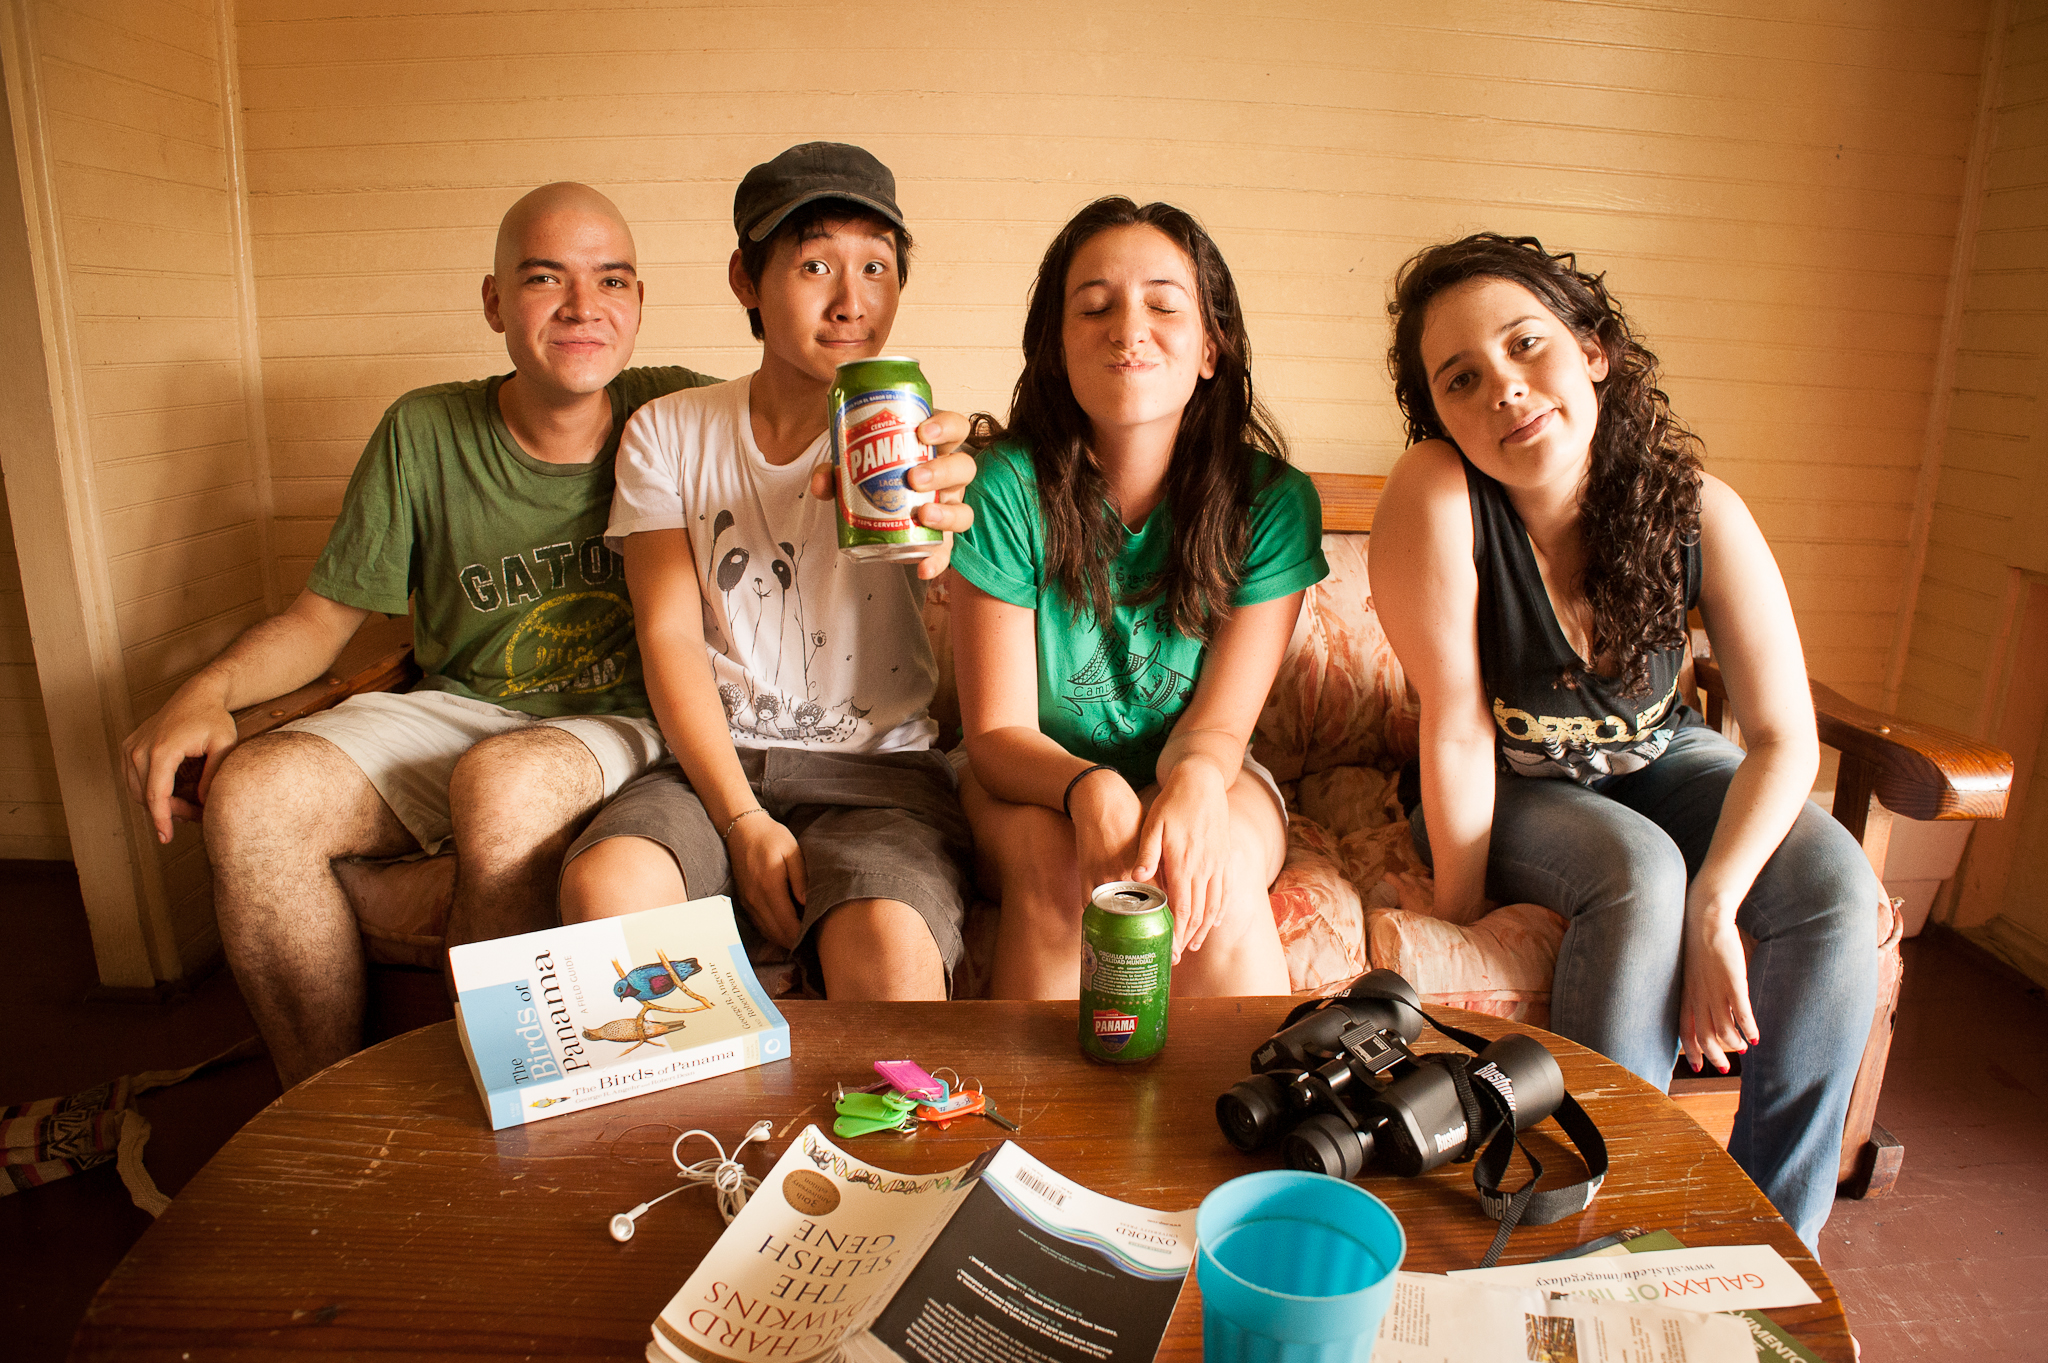 friends-sitting-table-photographer-Alex Tran